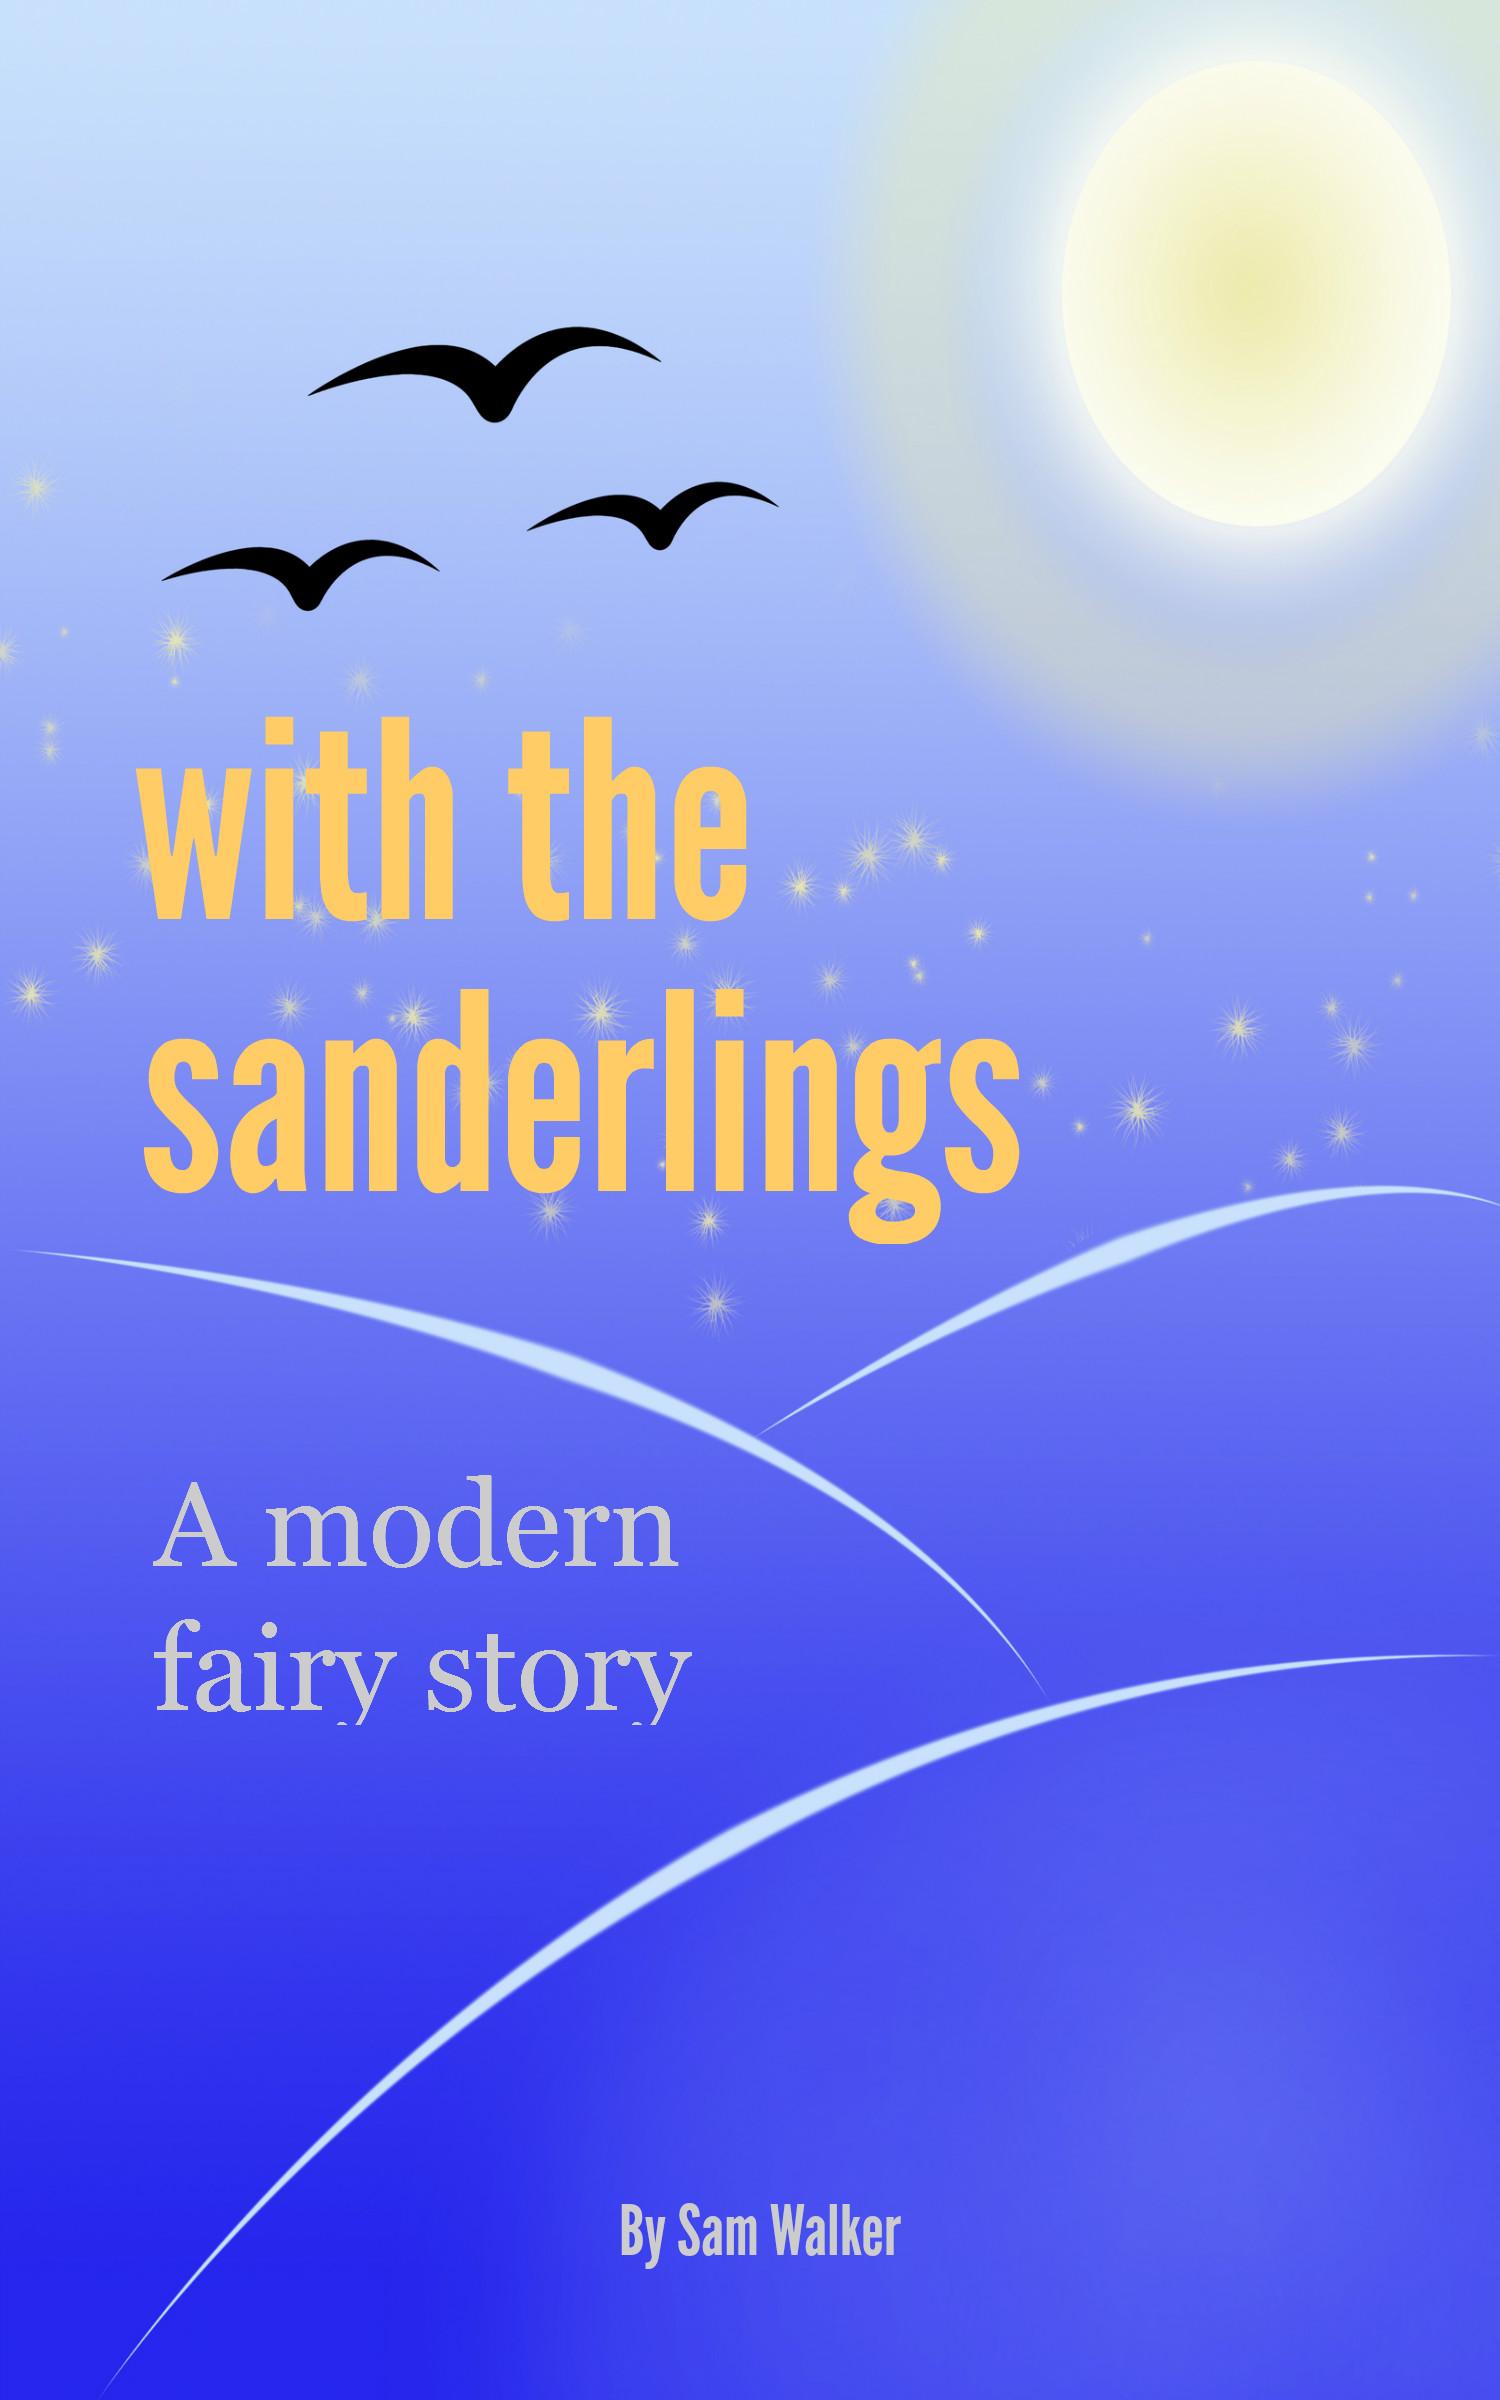 A modern fairy tale